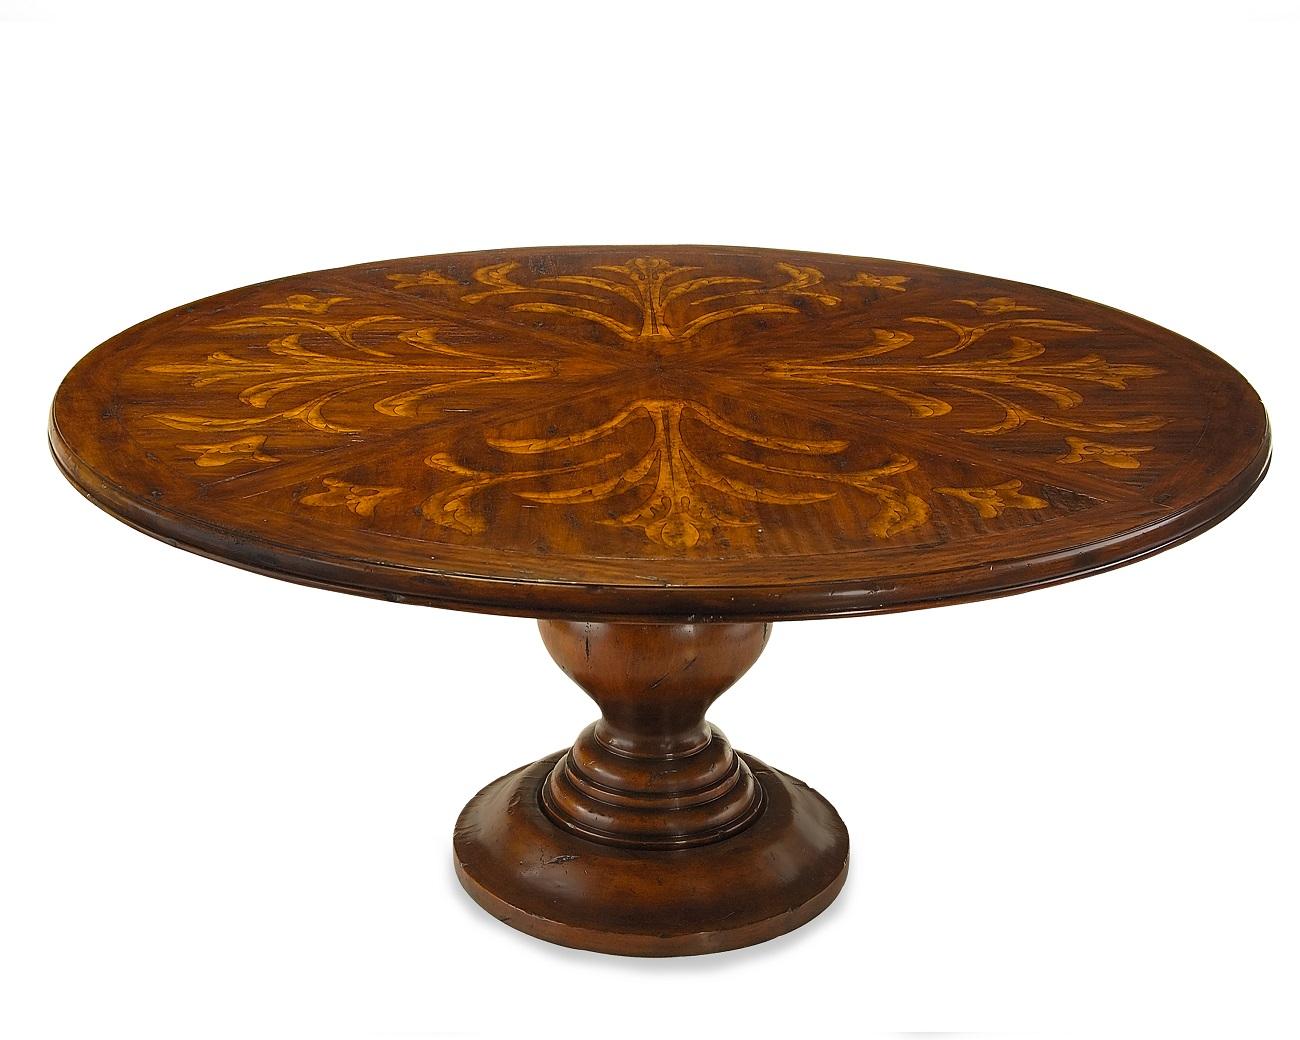 Villa Round Dining Table, John Richard Dining Table